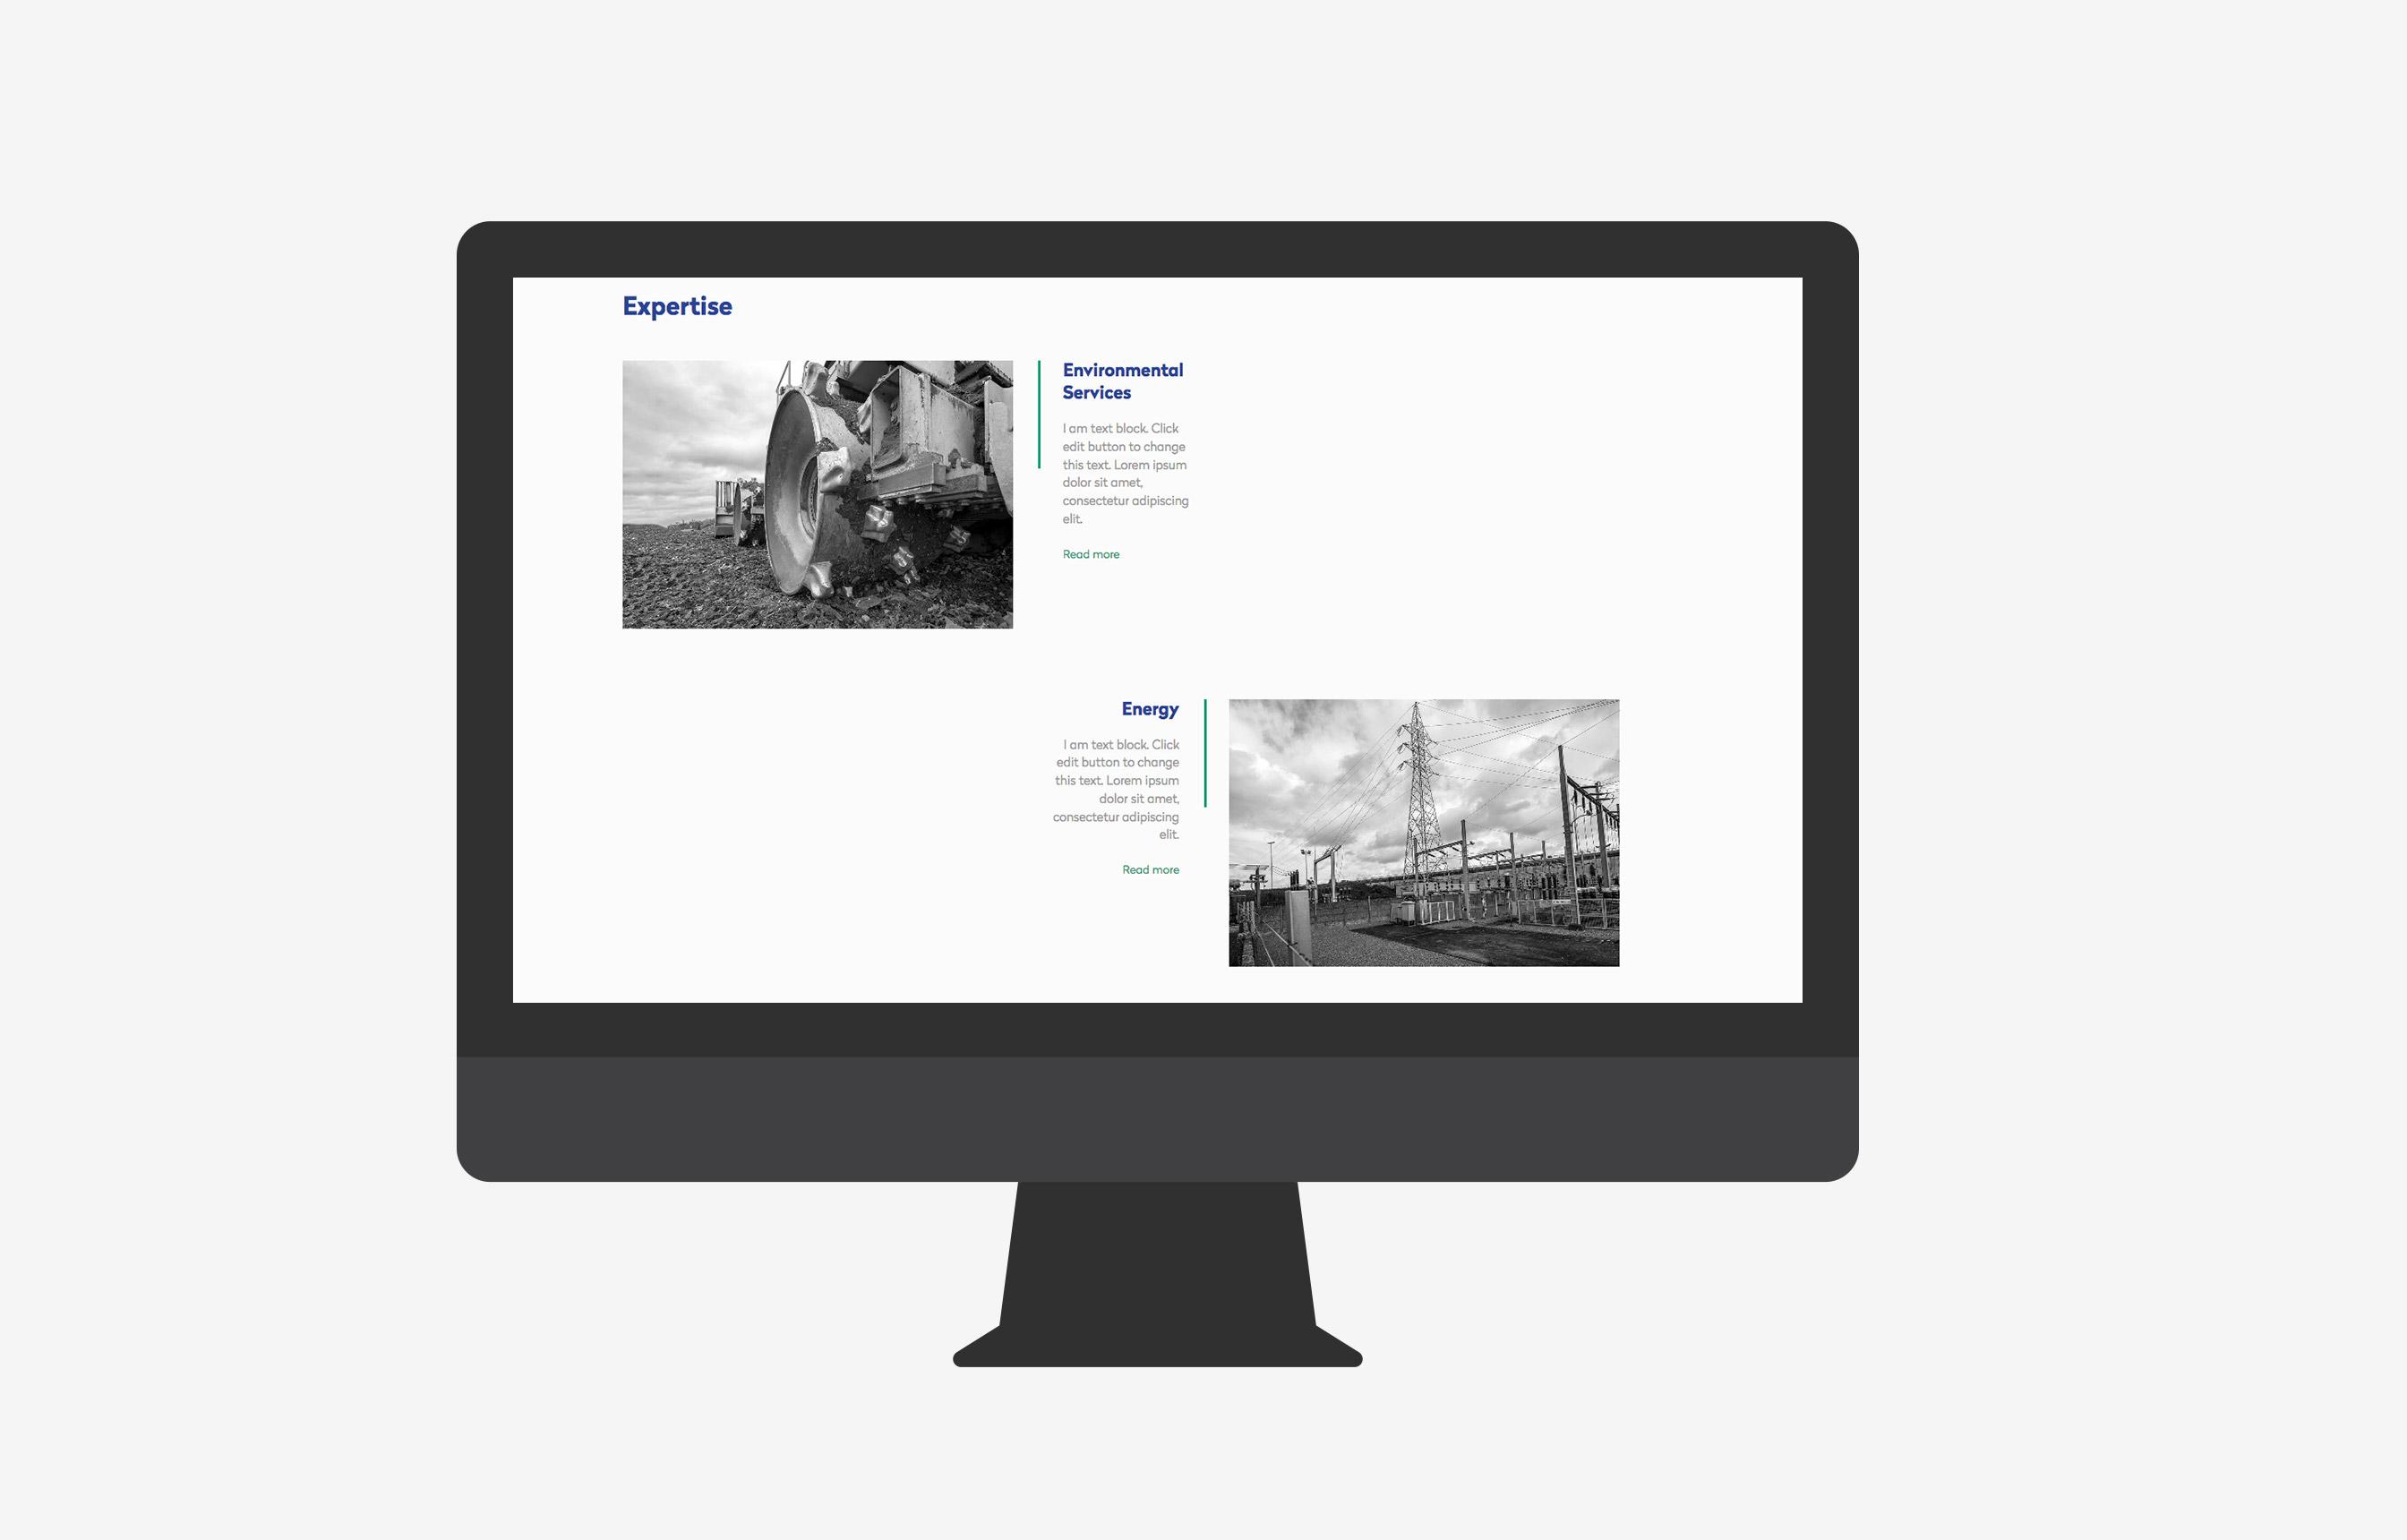 03-industrious-pikteo-webdesign-graphic-design-freelance-paris-bruxelles-londres